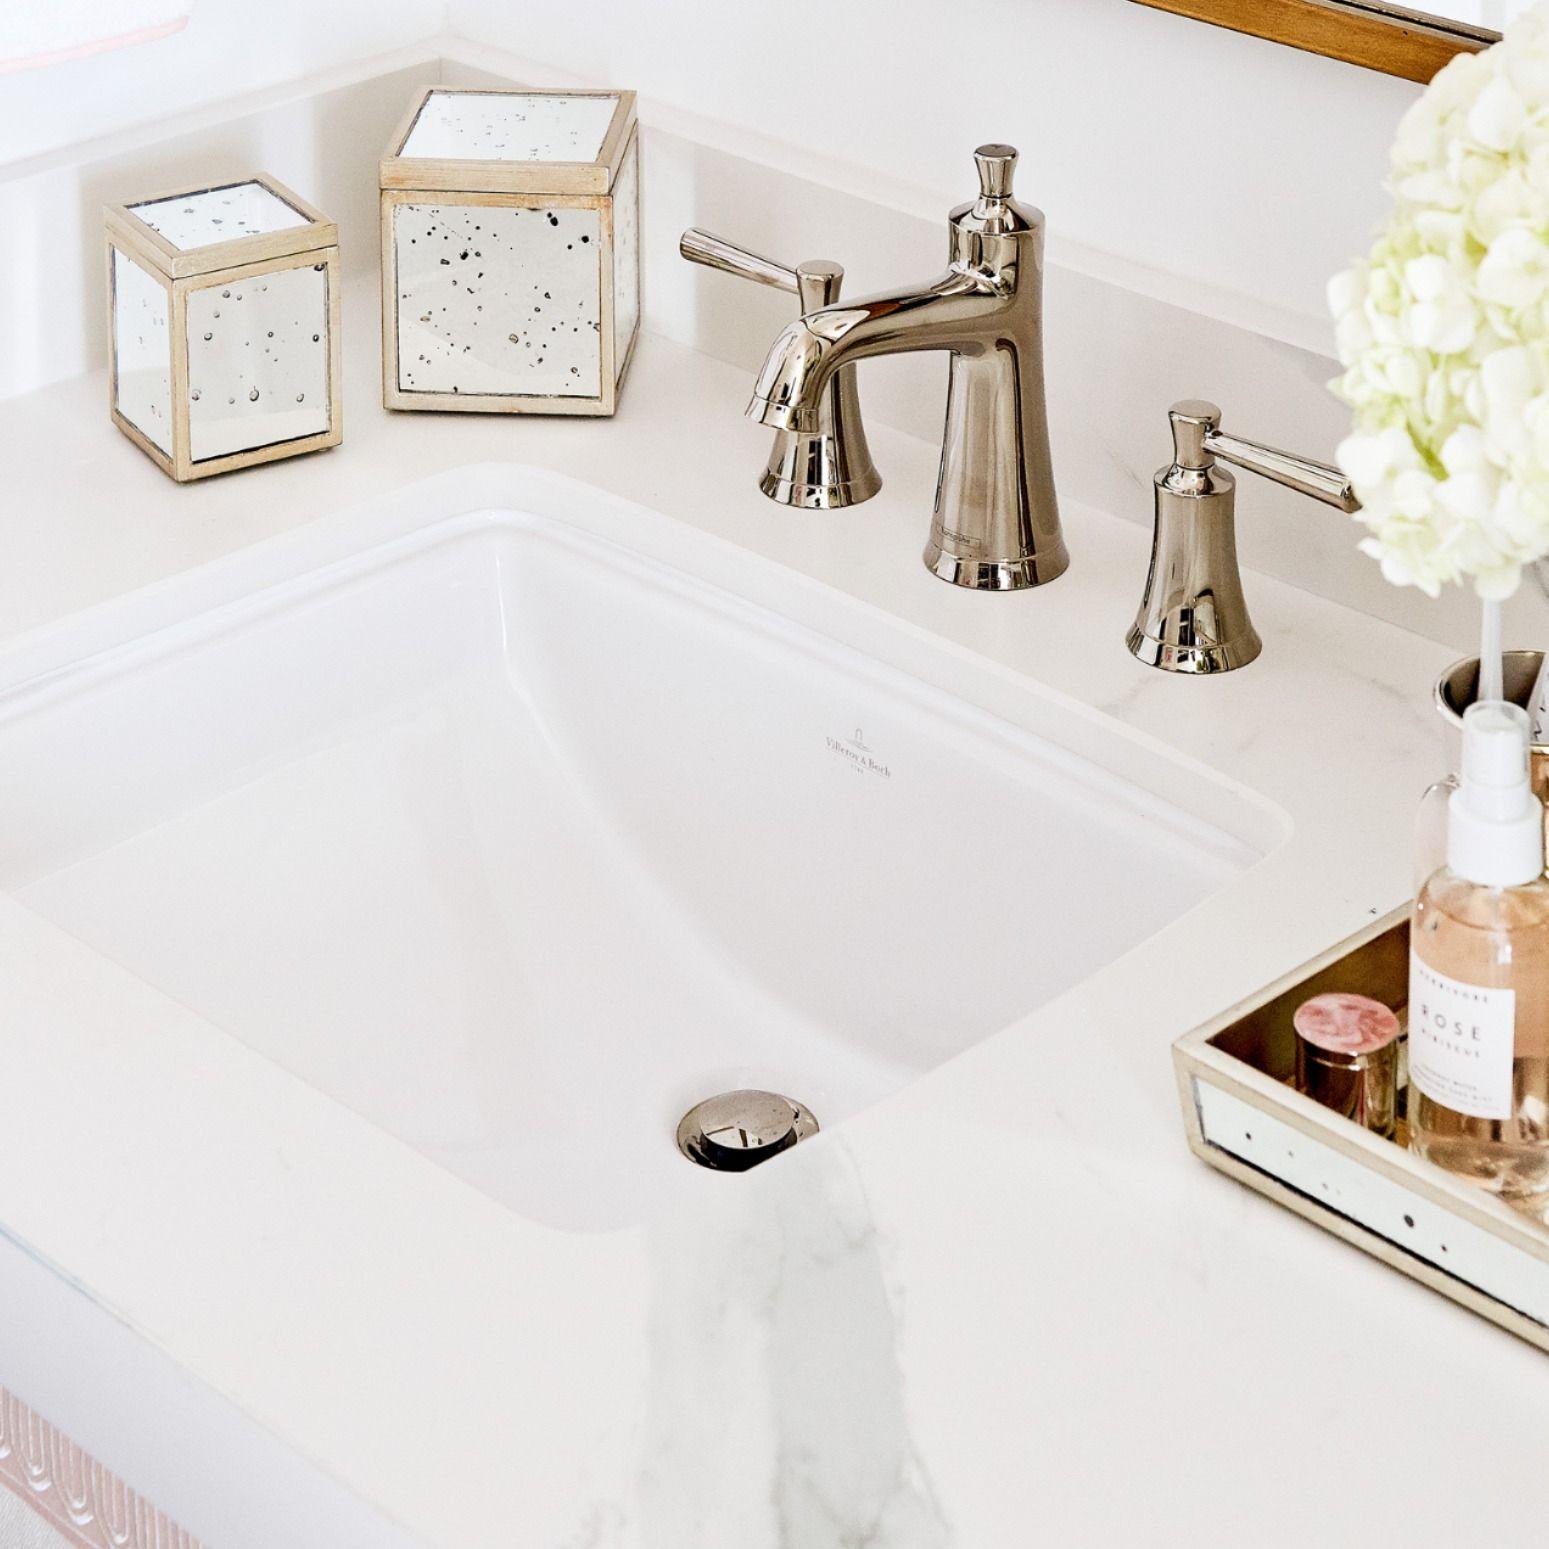 Joleena Widespread Bathroom Faucet In 2020 Macaubas Faucet Slipcovers For Chairs